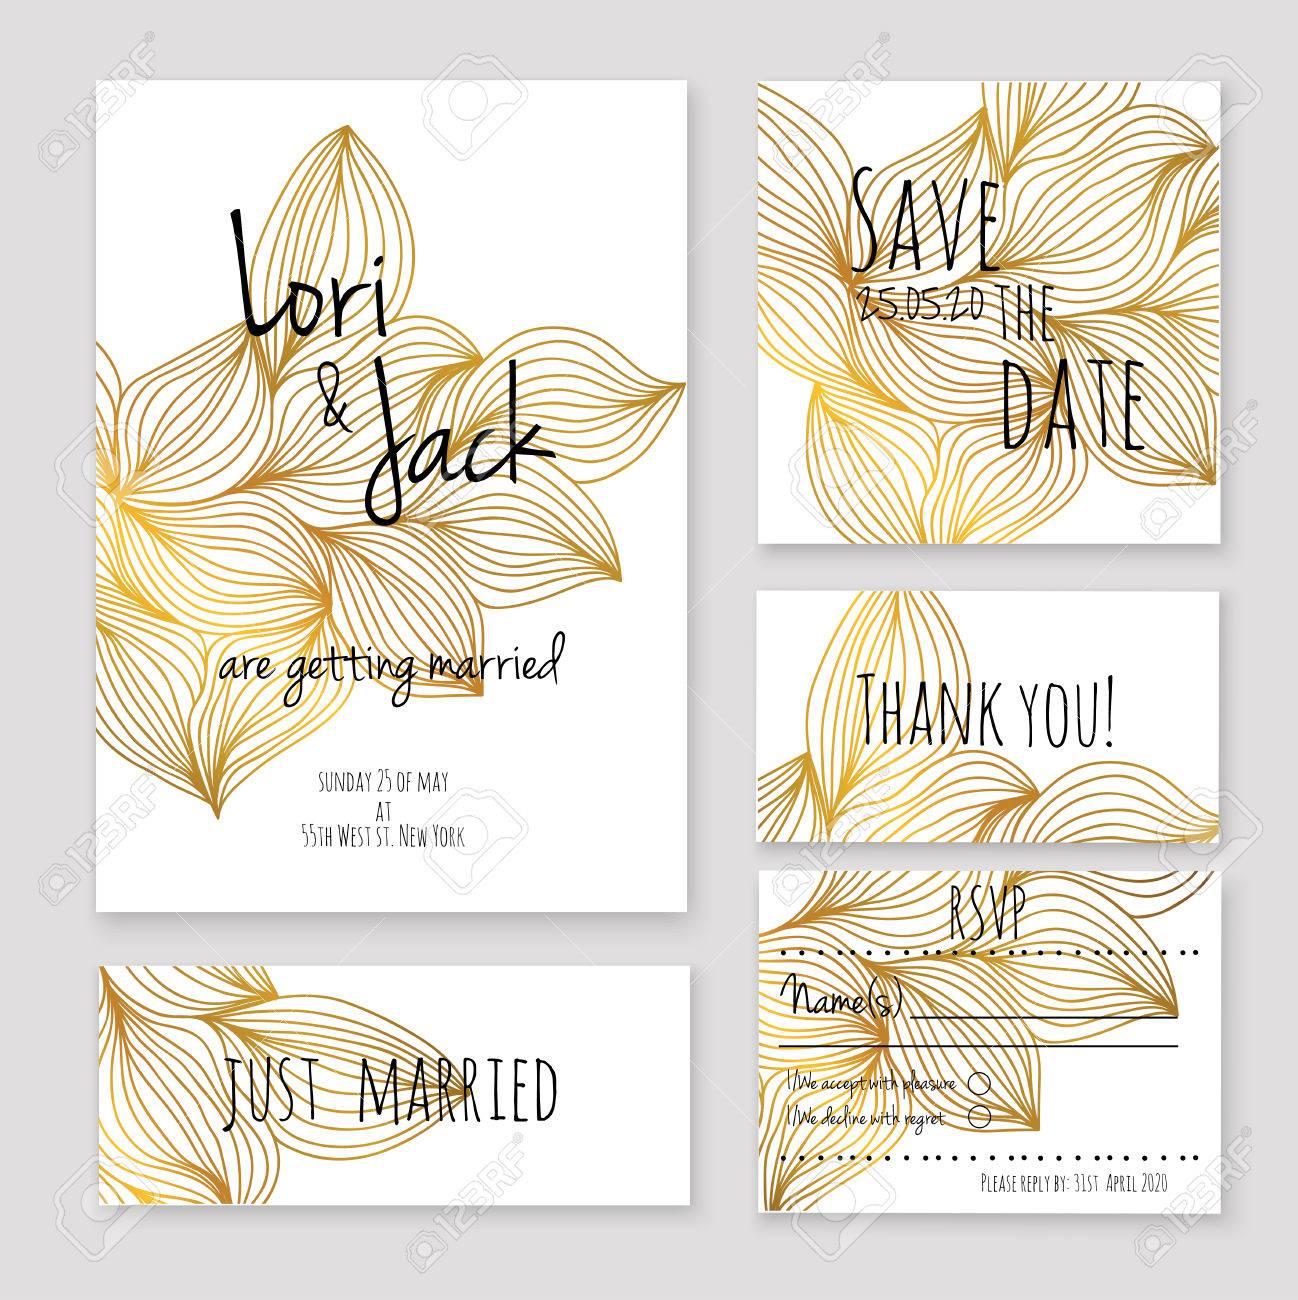 Wedding invitation card set. - 44057455